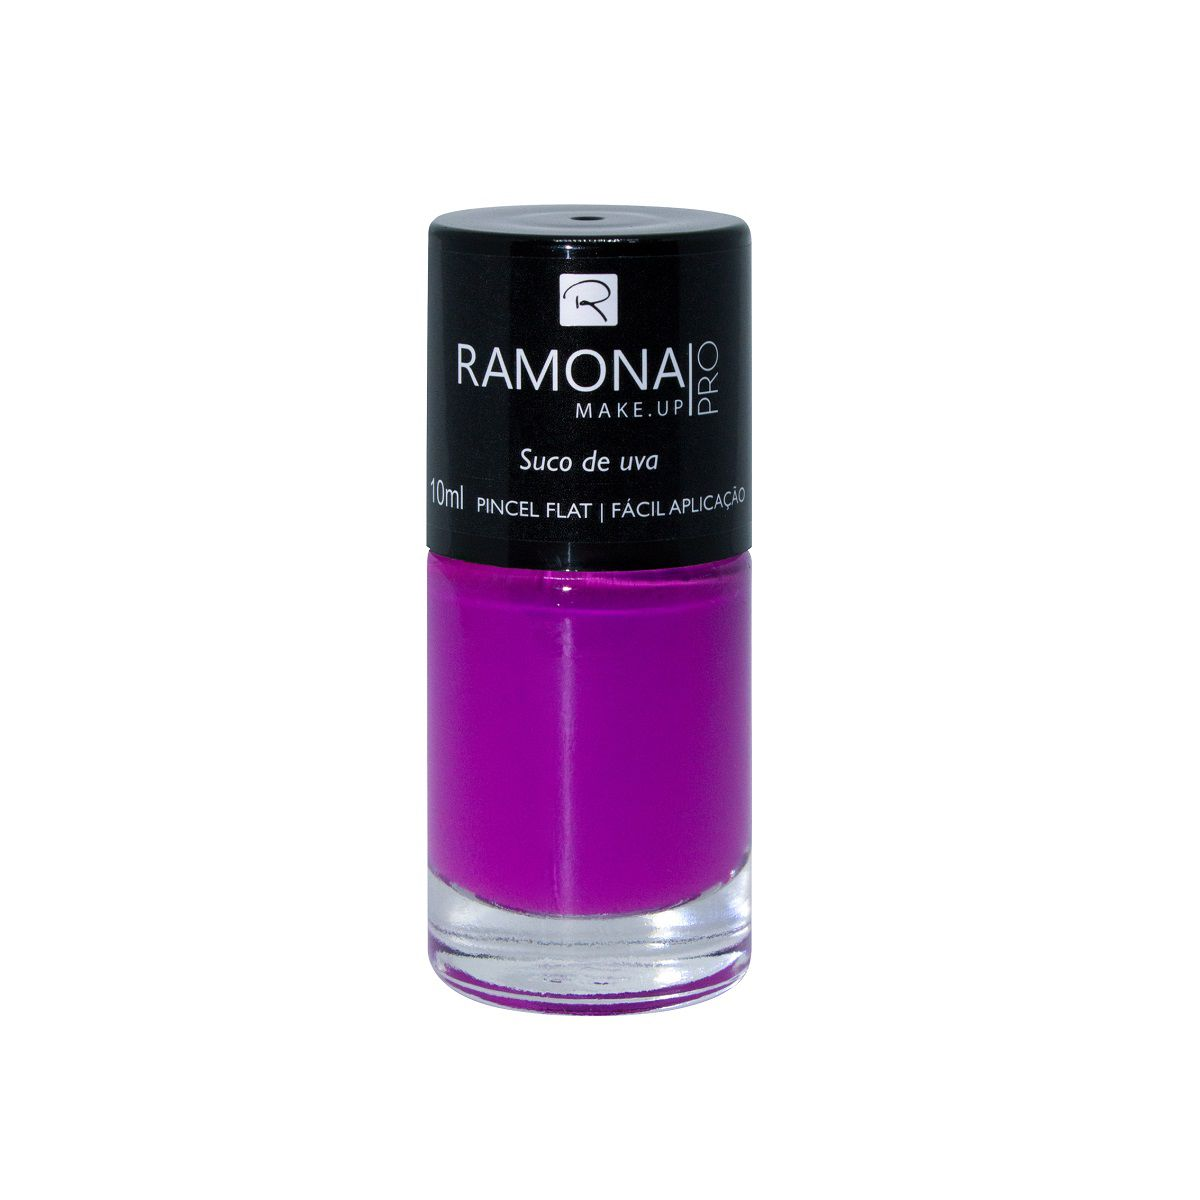 Esmalte cremoso Ramona Cosméticos Suco de uva 10ml